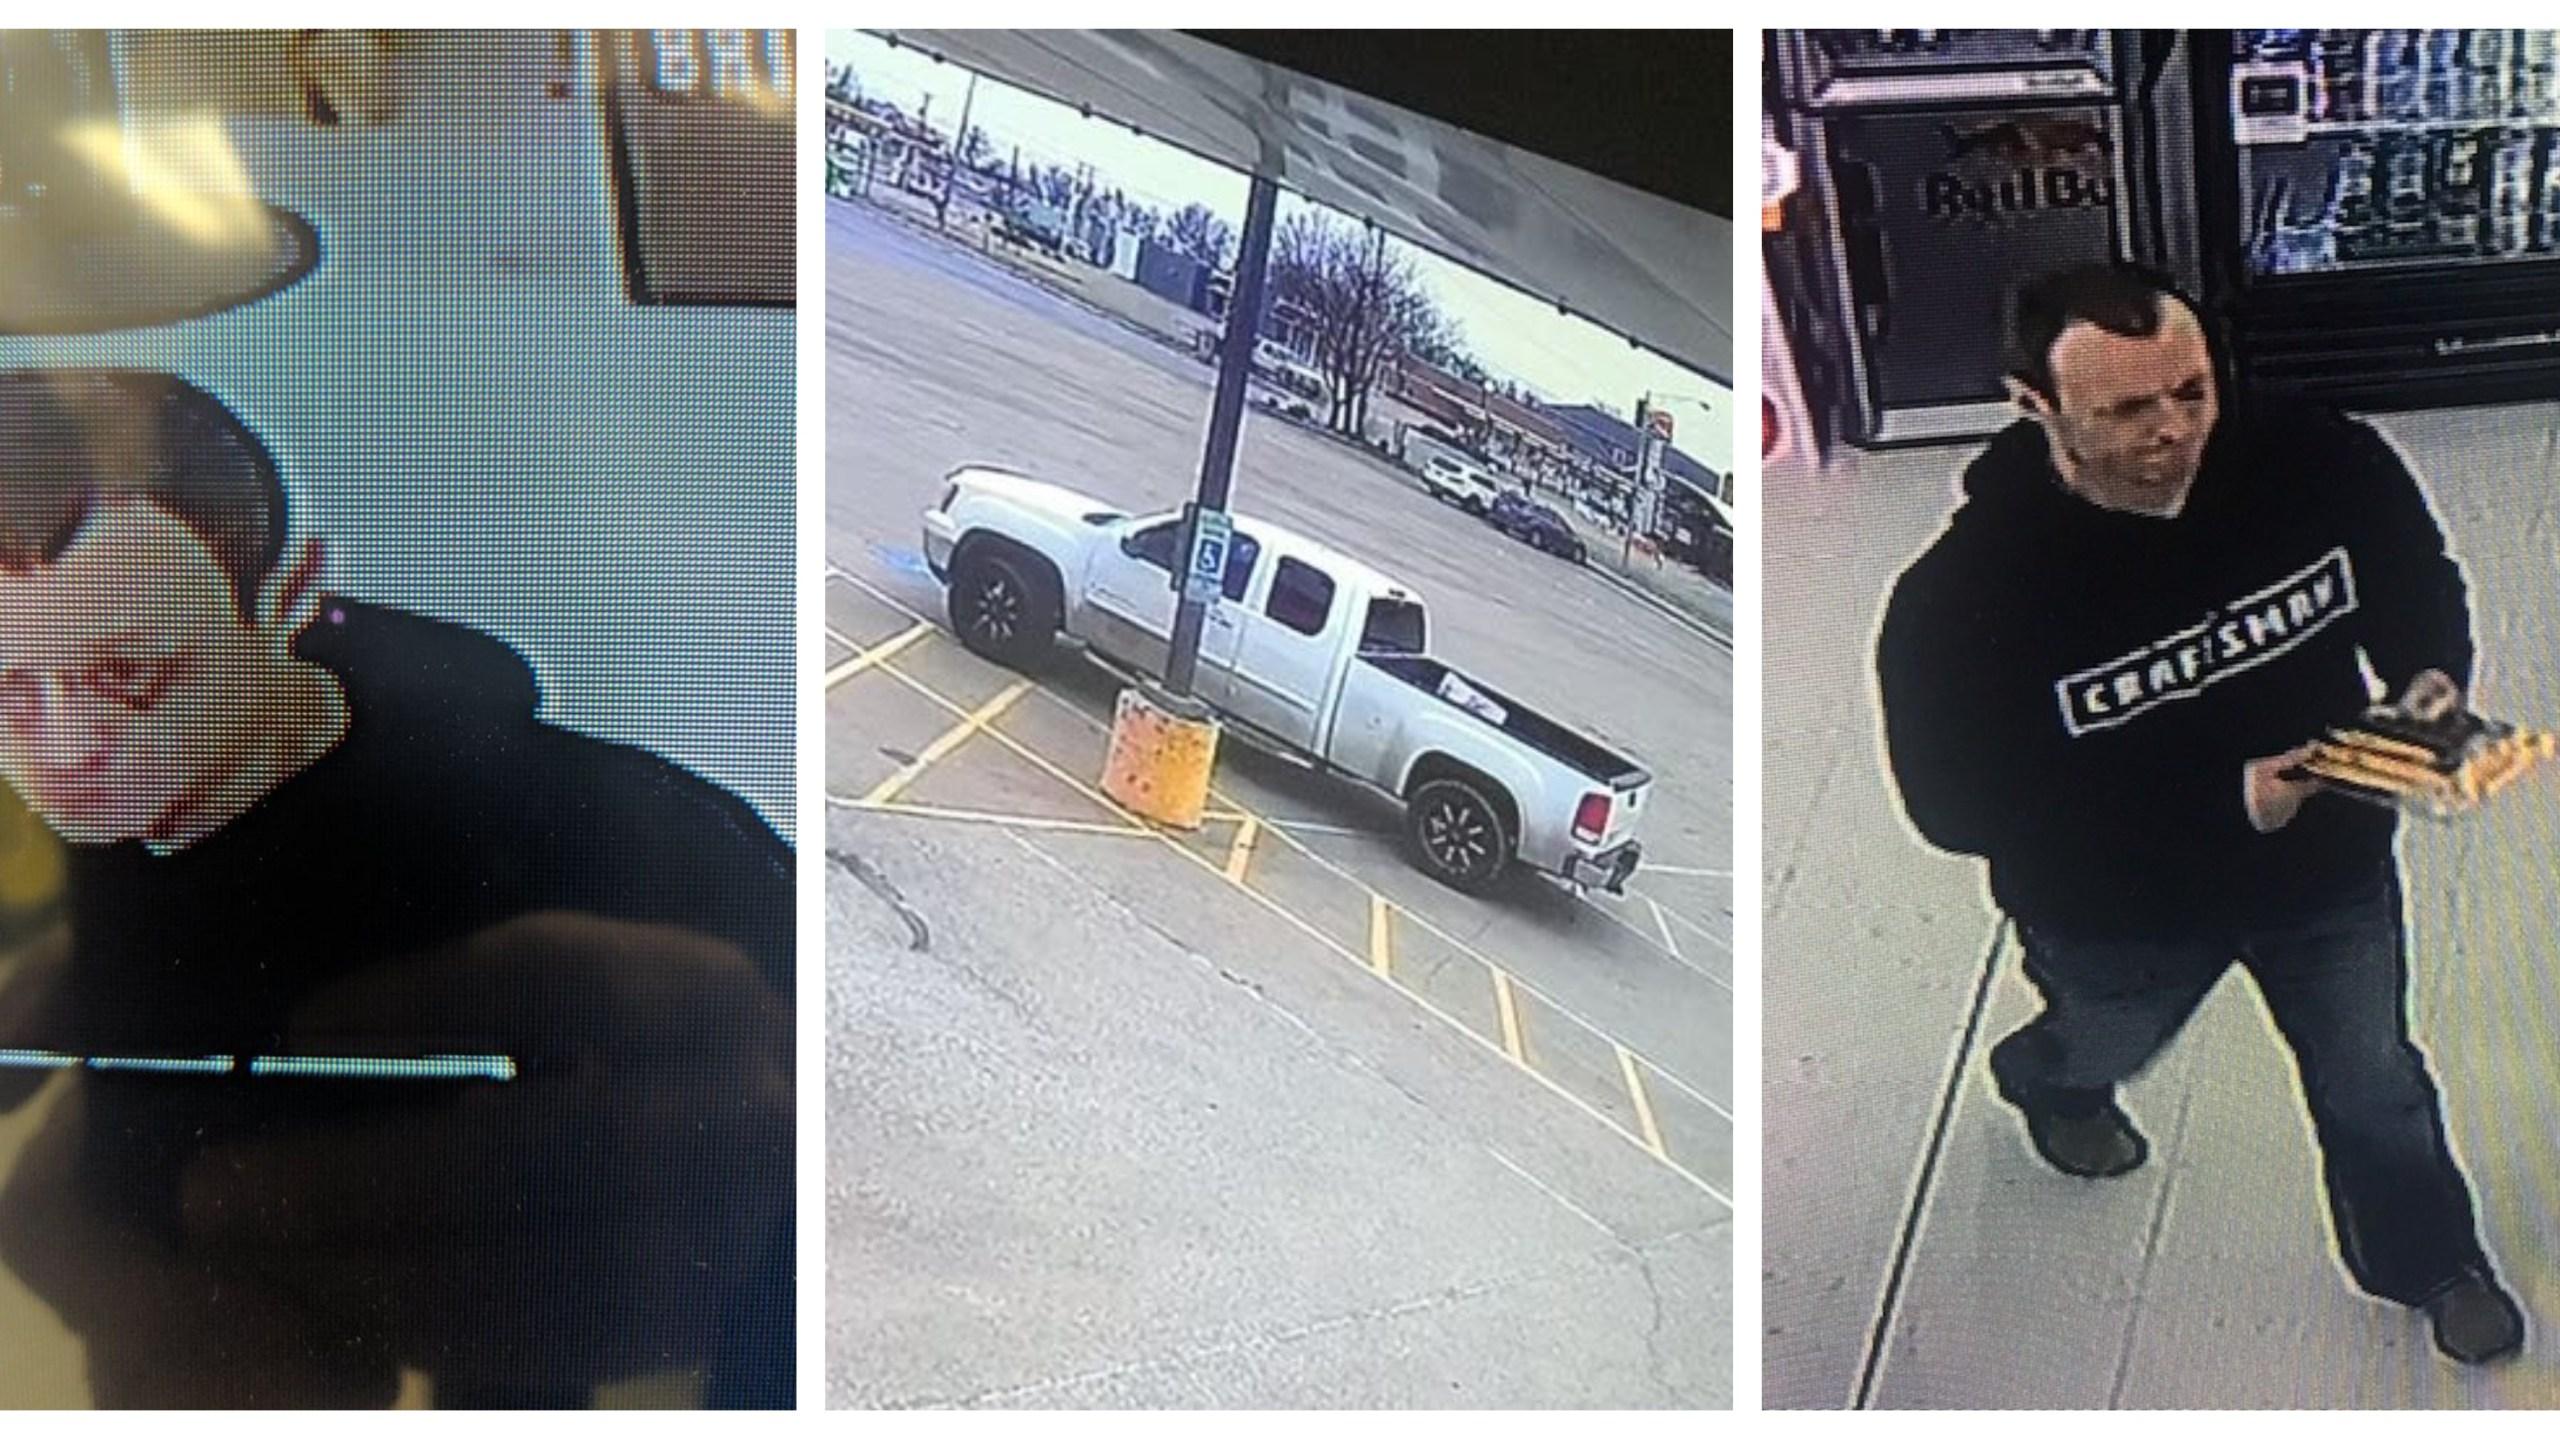 shoplift suspect_1548091409850.jpg.jpg